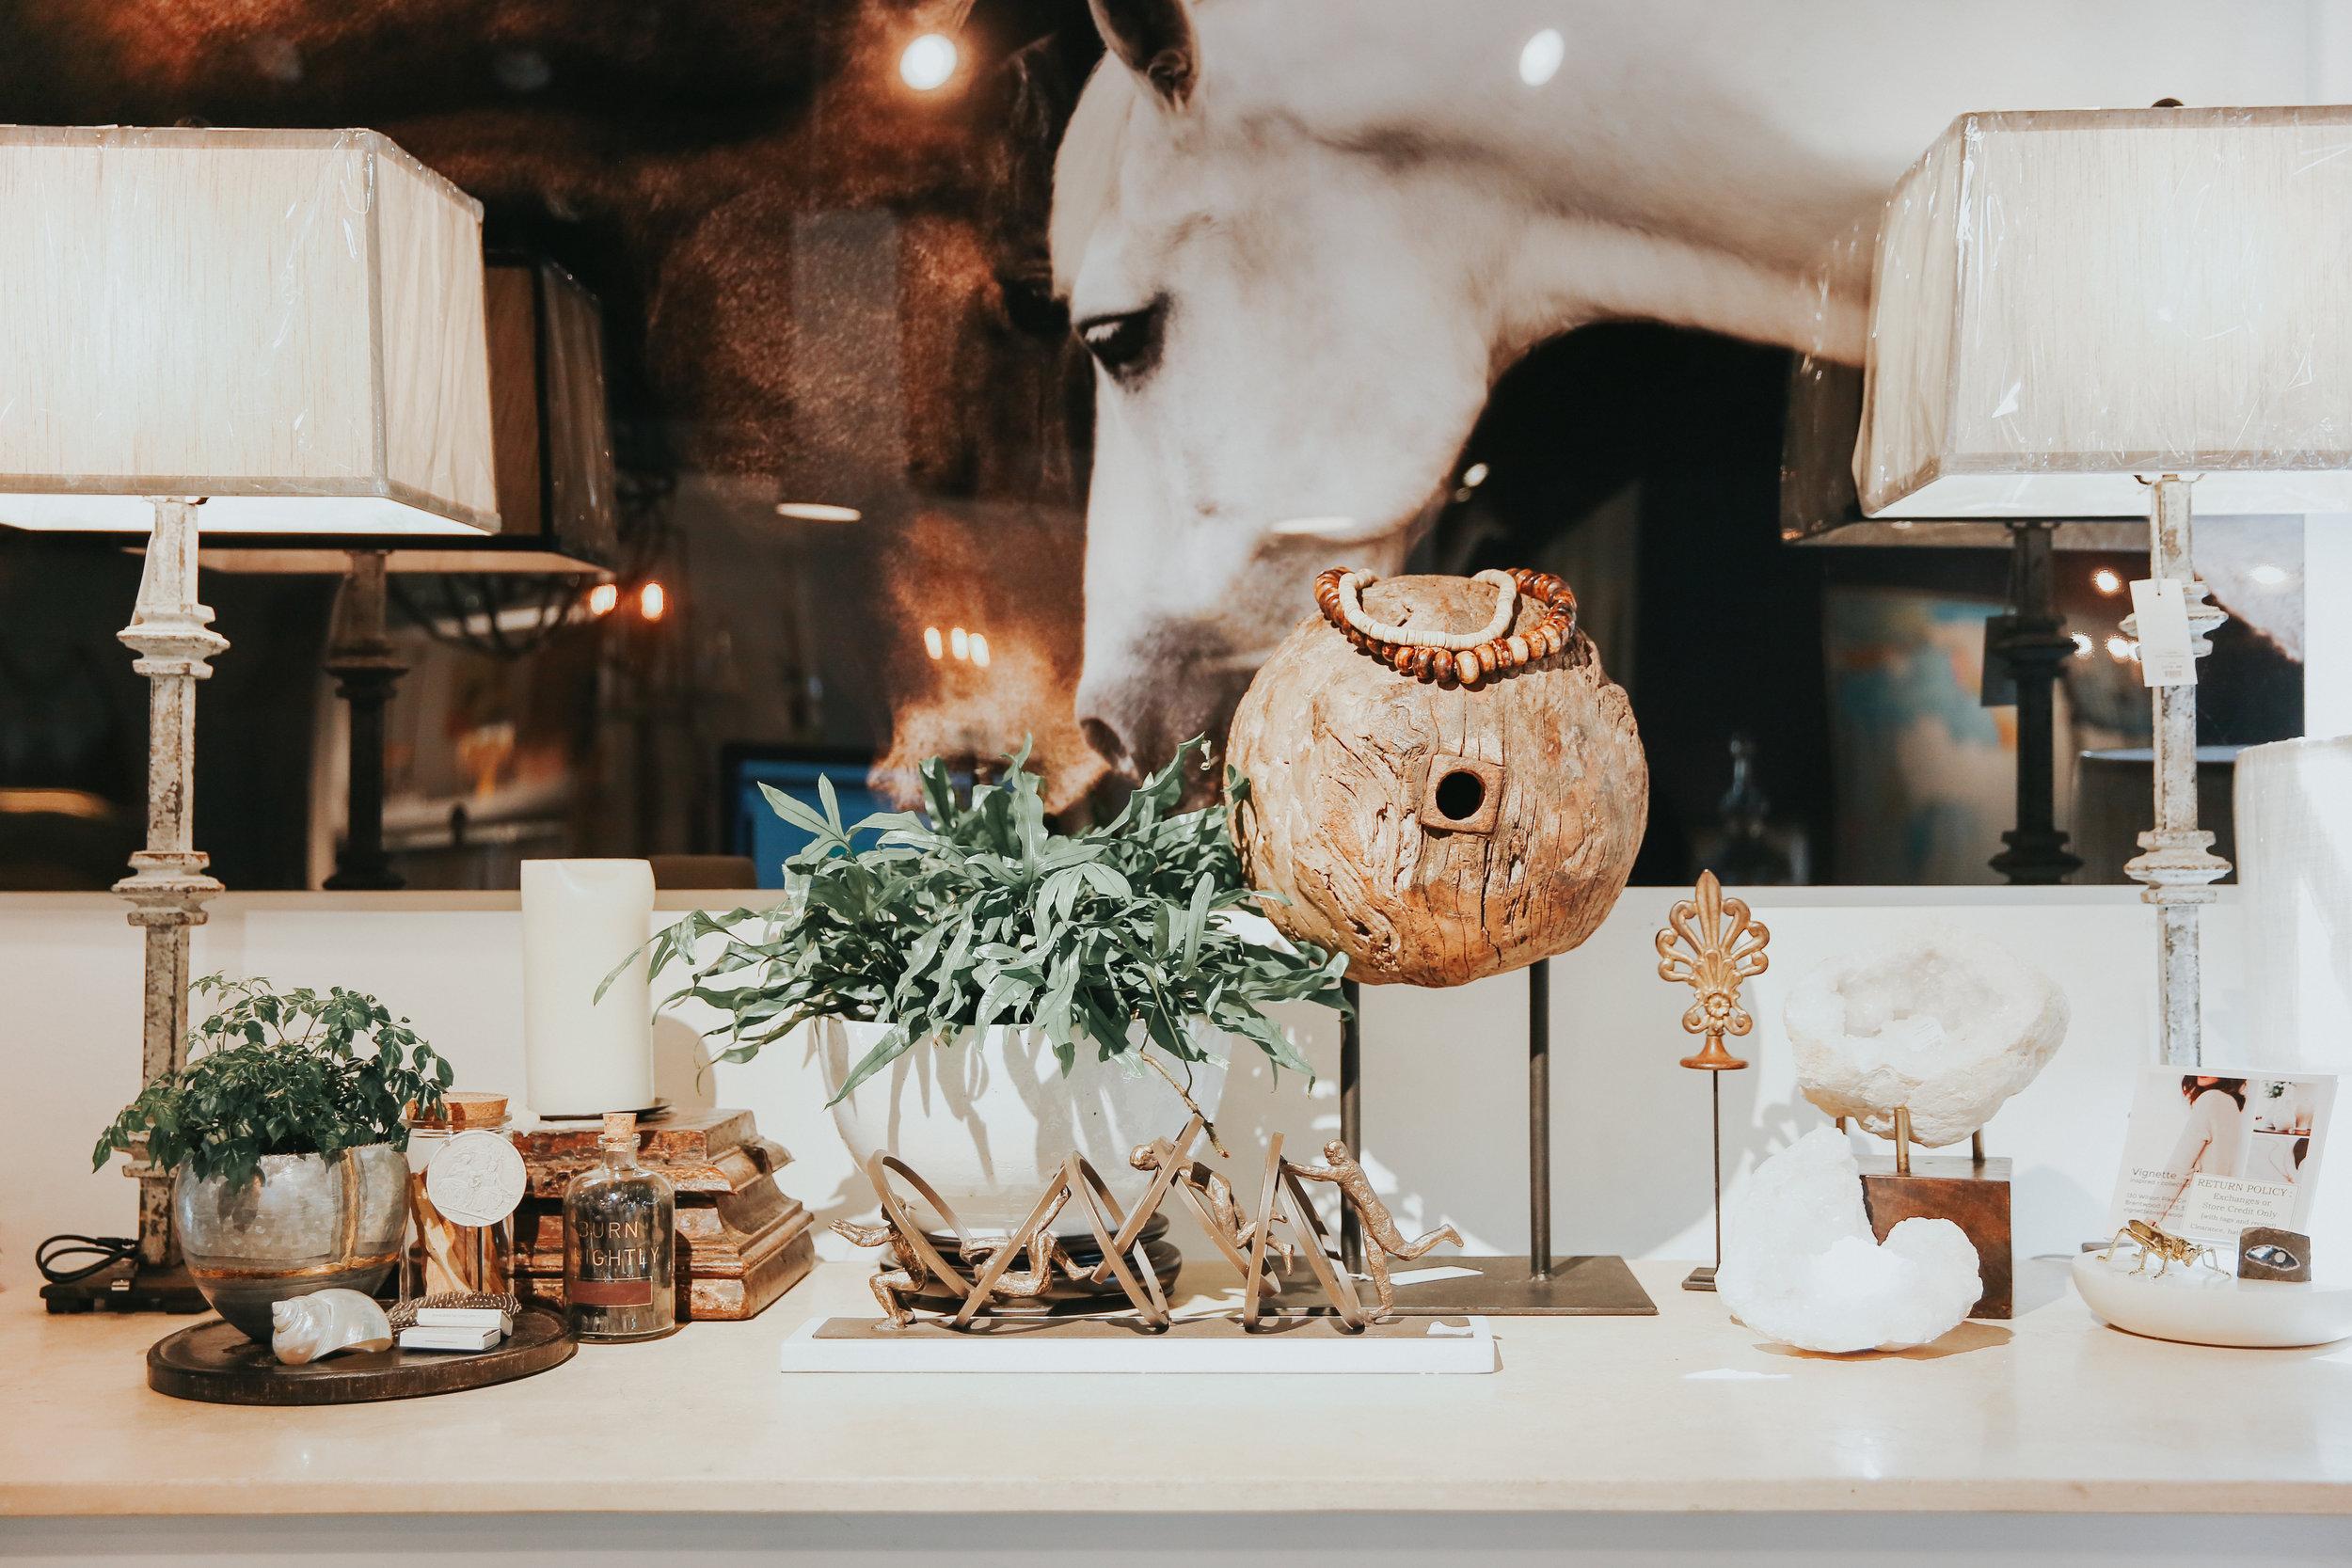 Boutique home decor items